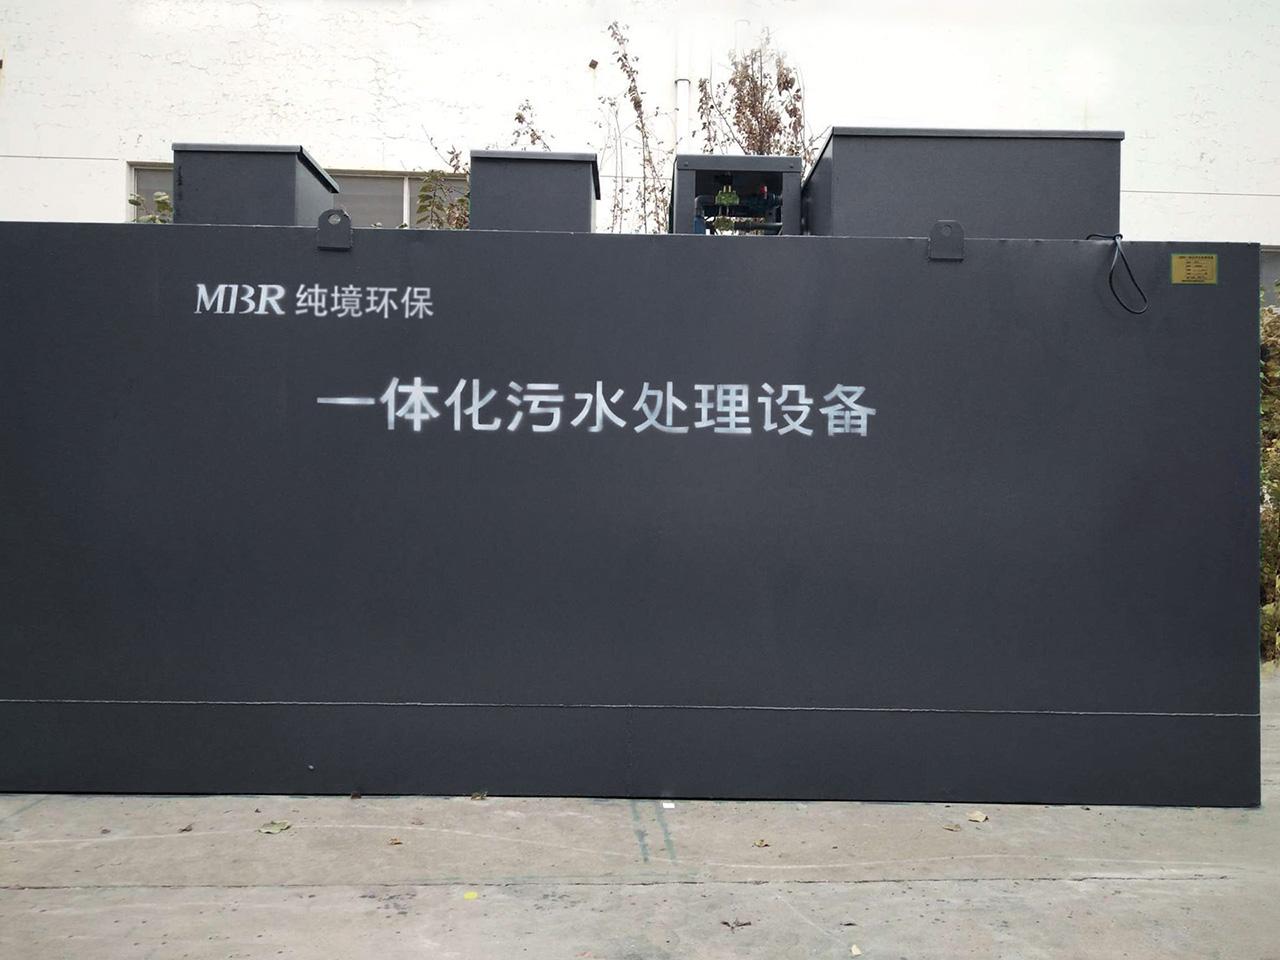 MBR一体化-西安污水处理设备